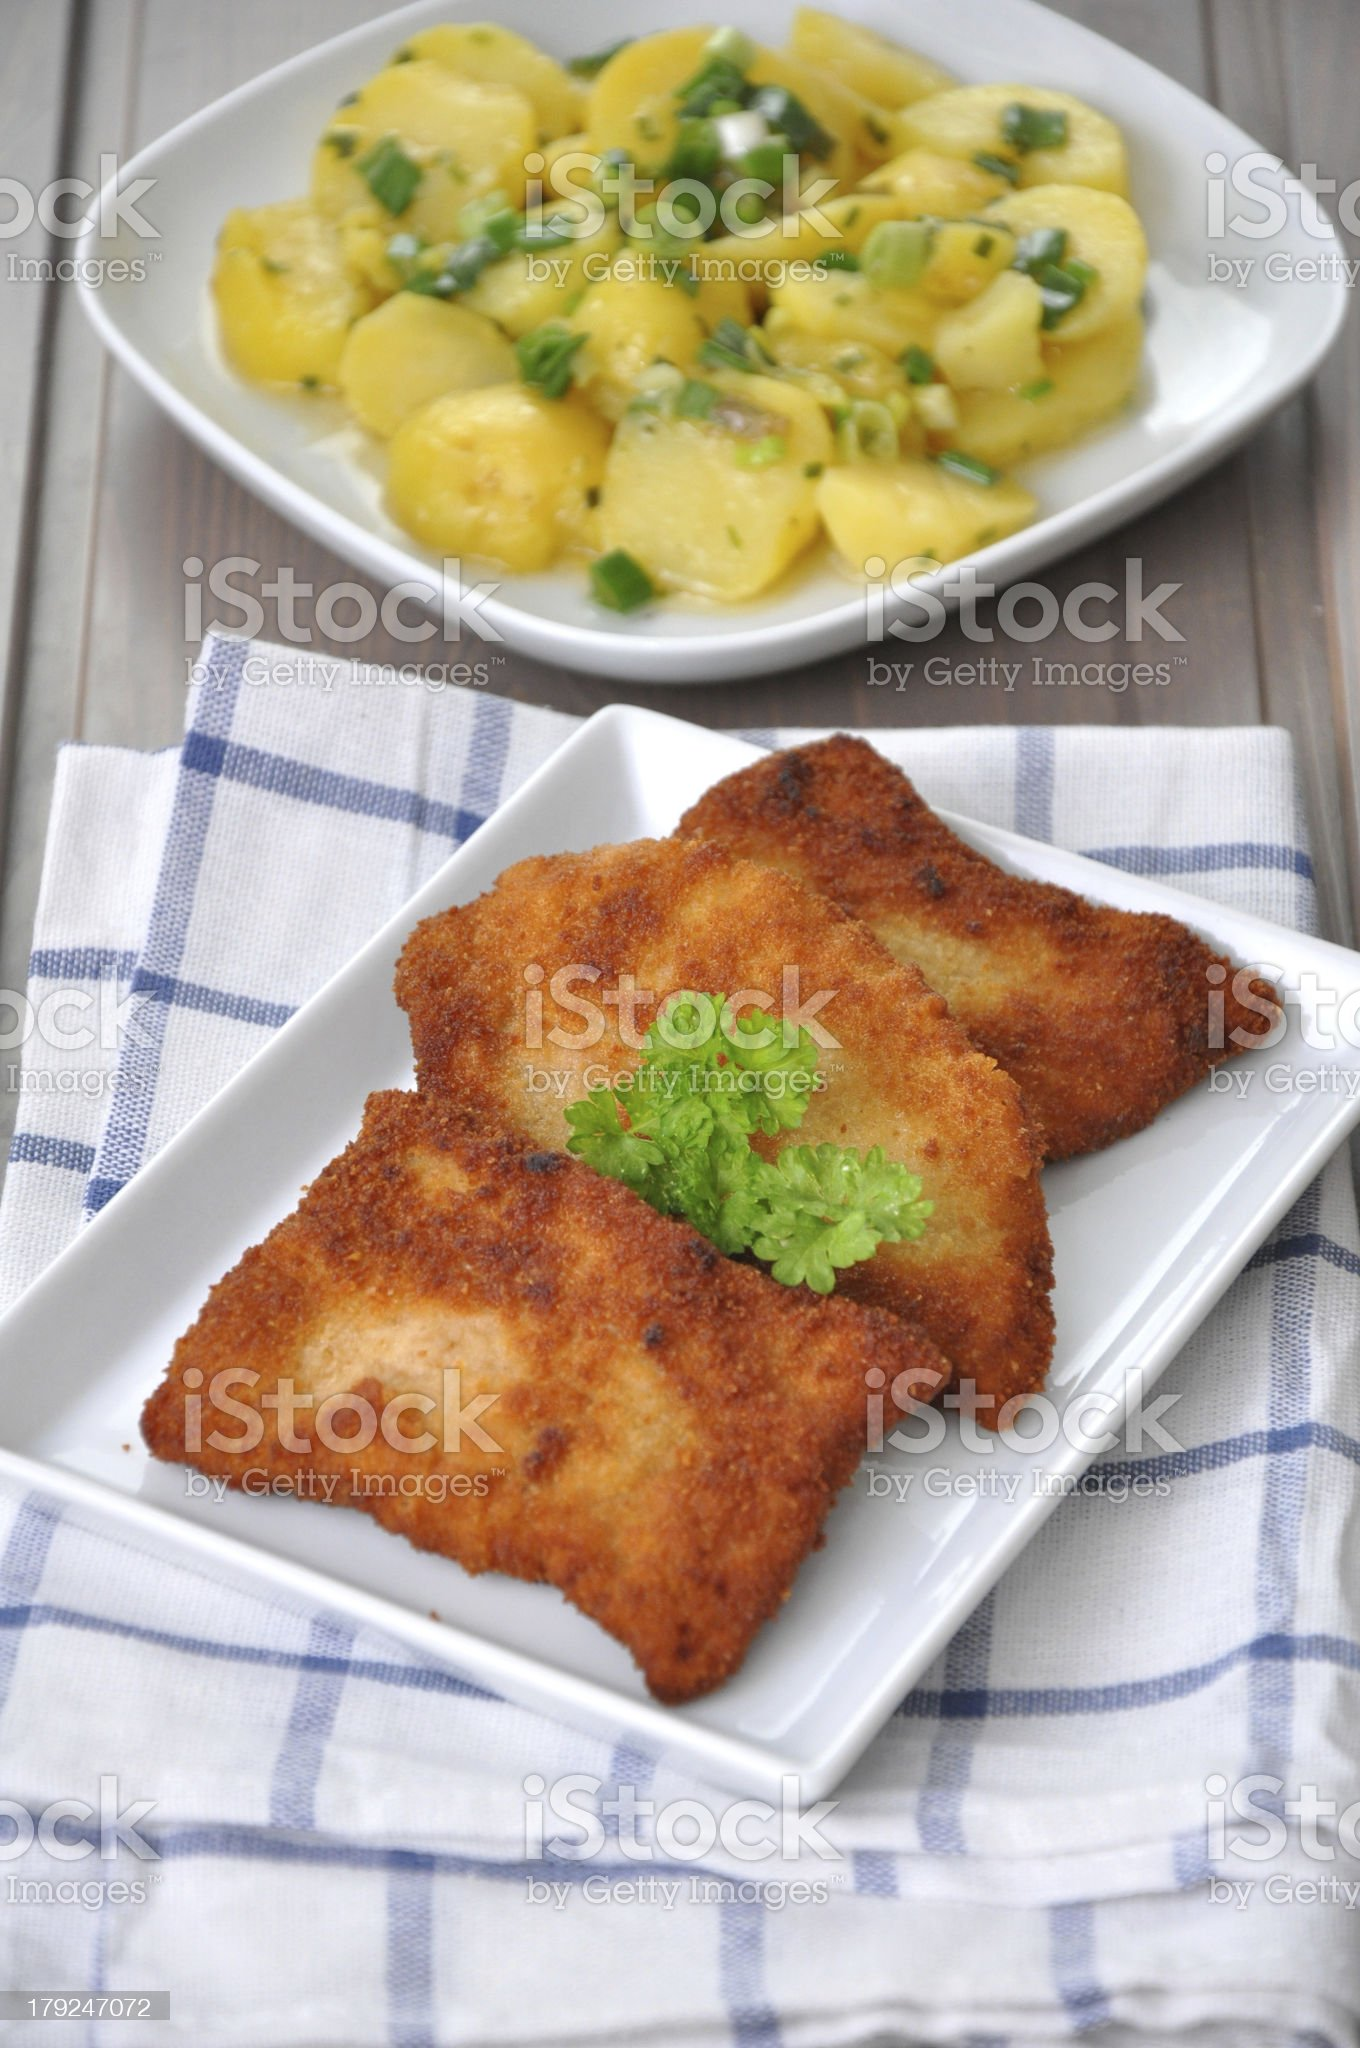 Wiener Schnitzel with potato salad royalty-free stock photo